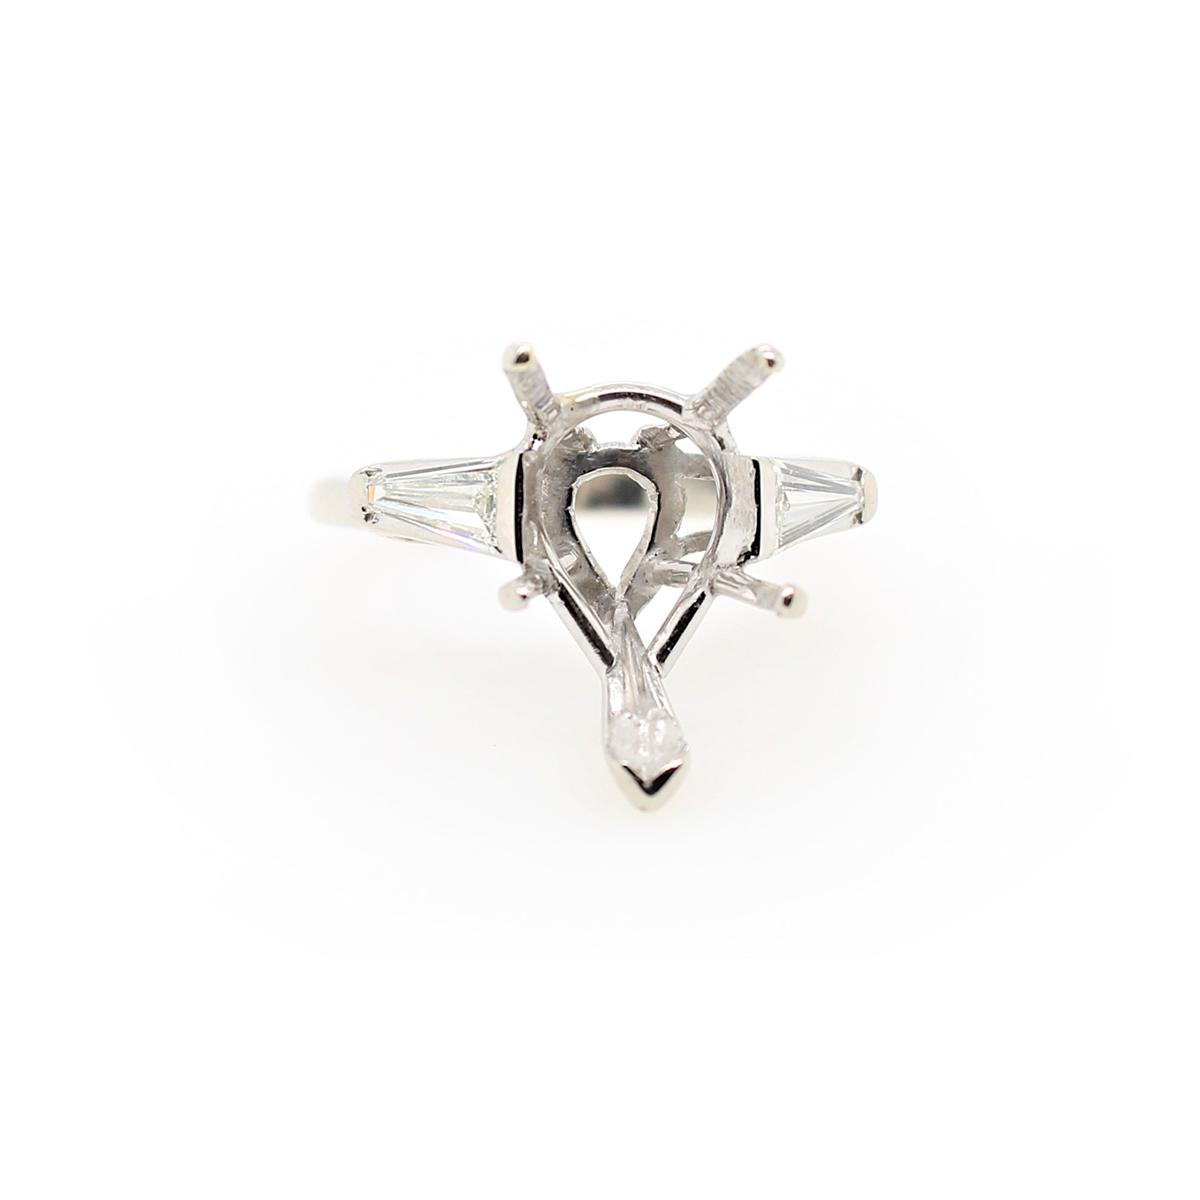 Vintage Platinum Pear Shaped Semi-Mount Ring